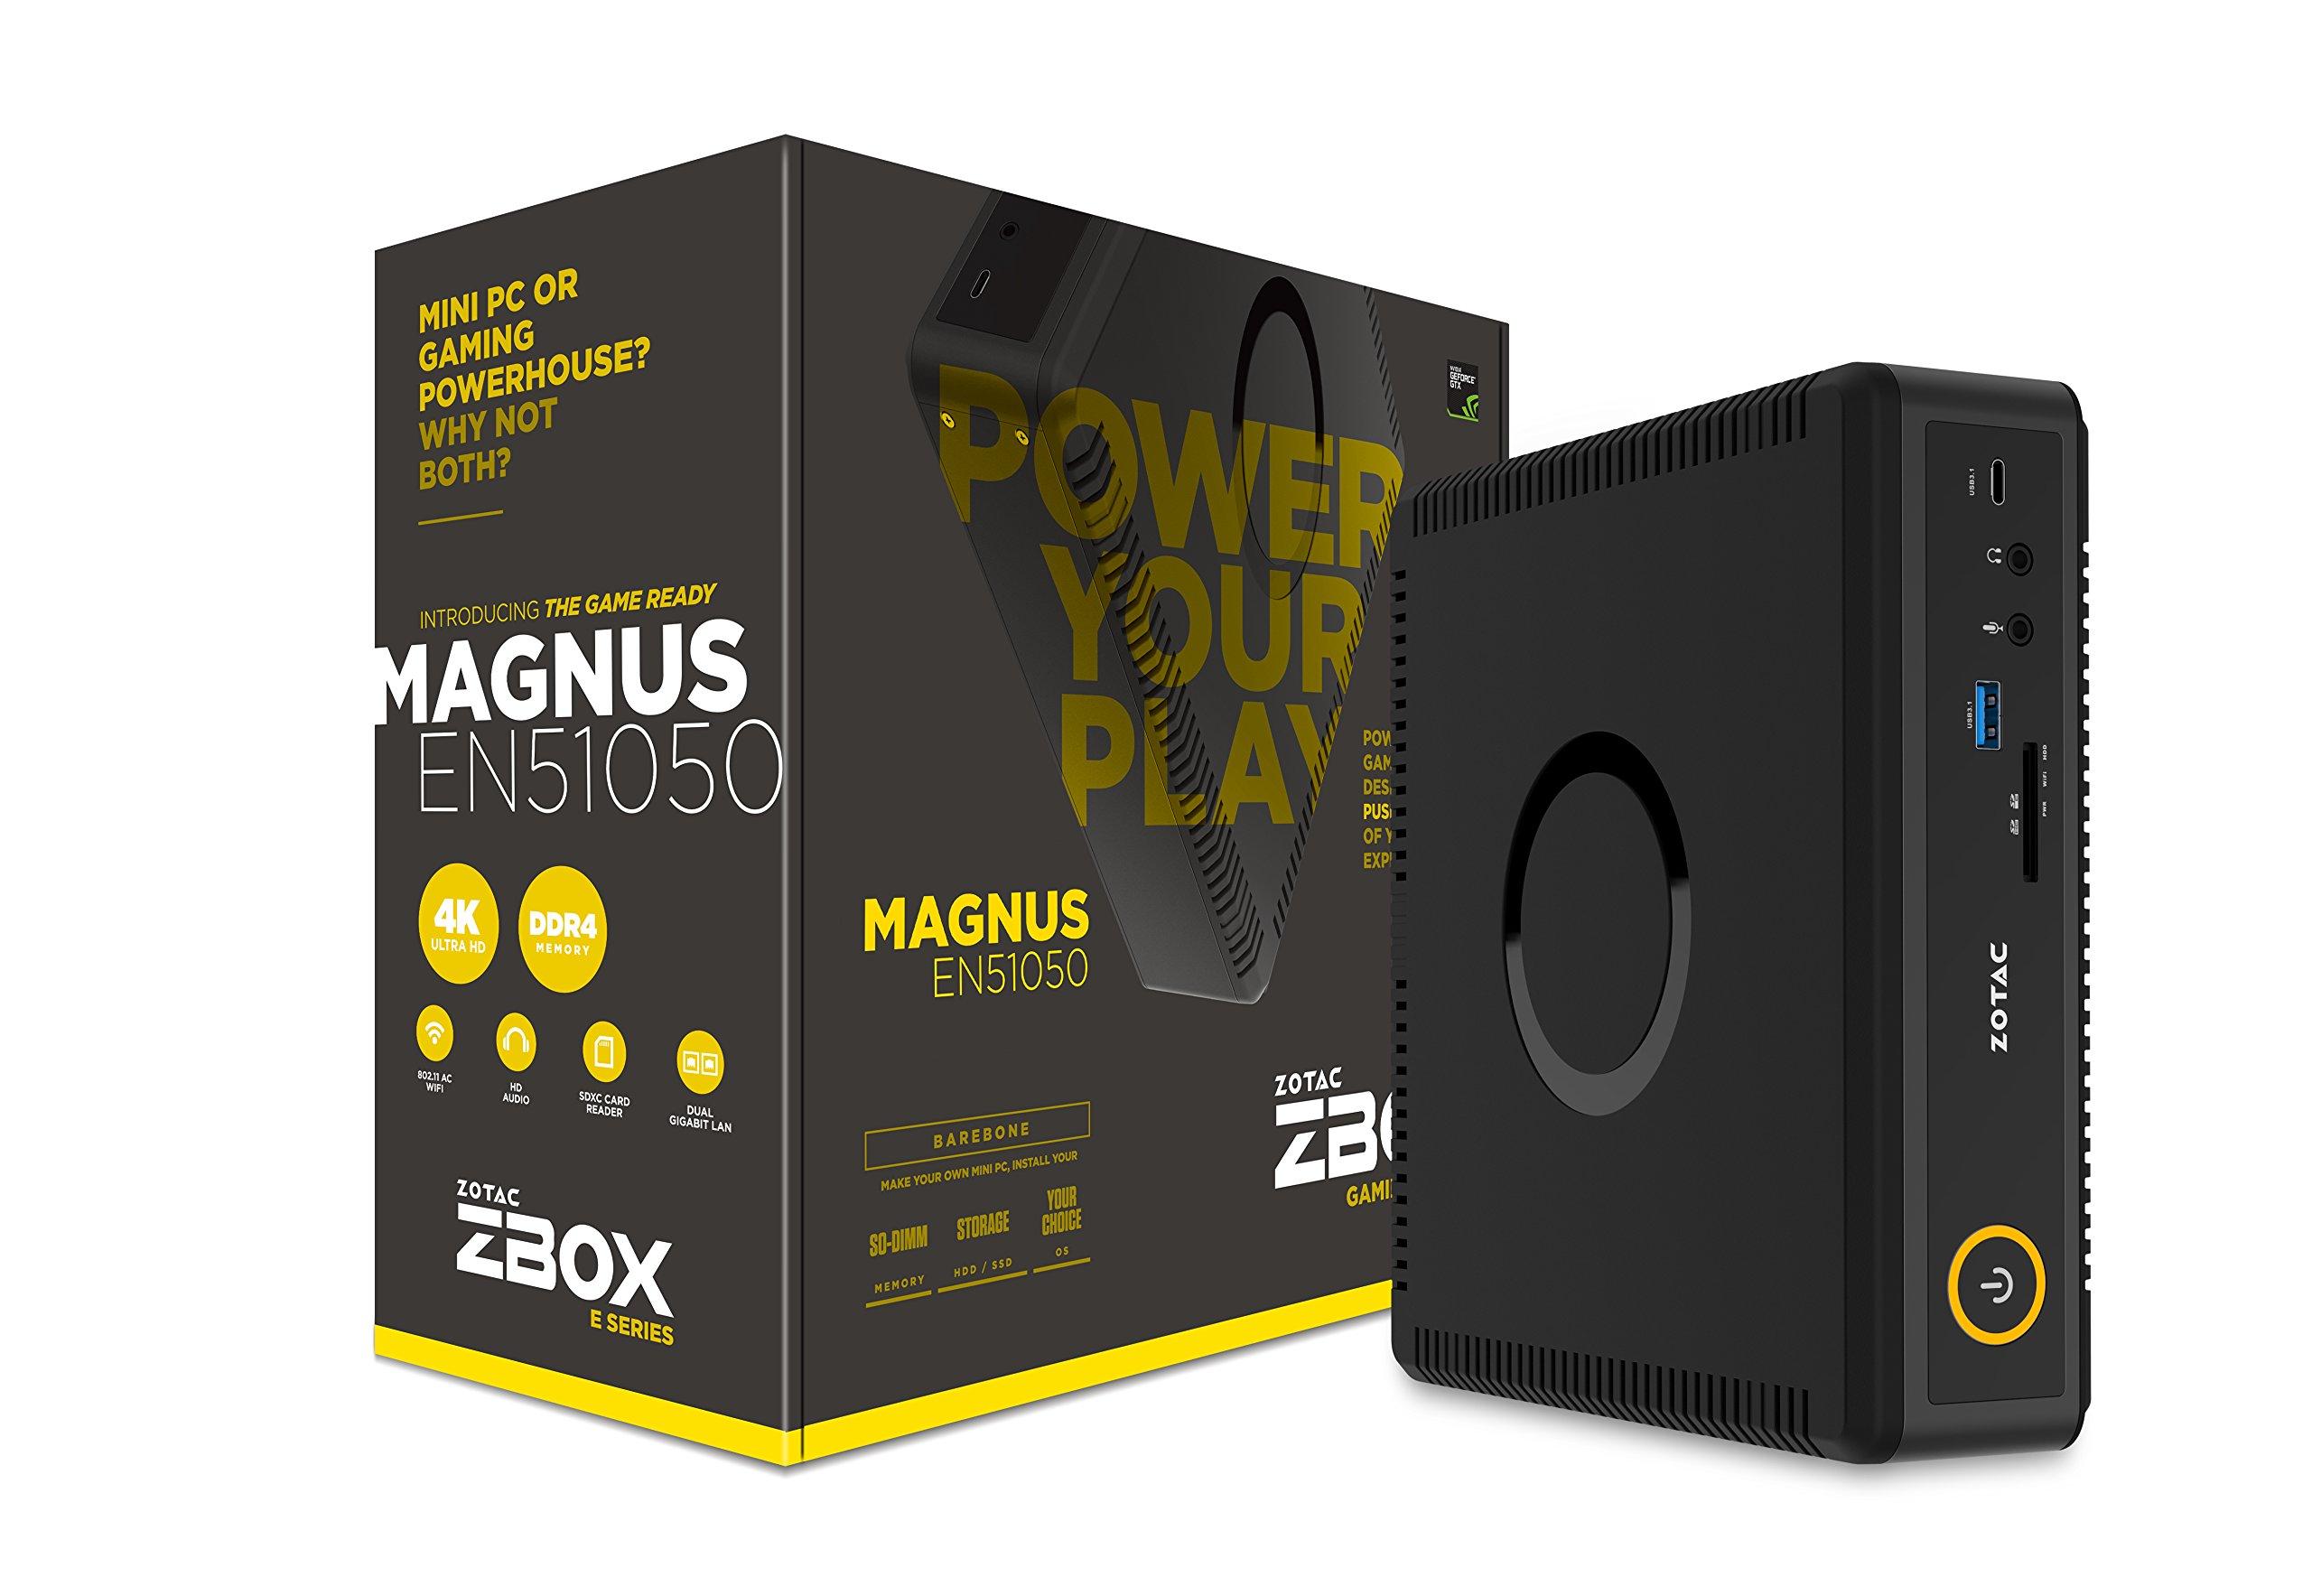 ZOTAC Magnus EN51050 Gaming Mini PC Intel Kaby Lake Core i5 NVIDIA GeForce GTX 1050 4K Display Barebone (ZBOX-EN51050-U)